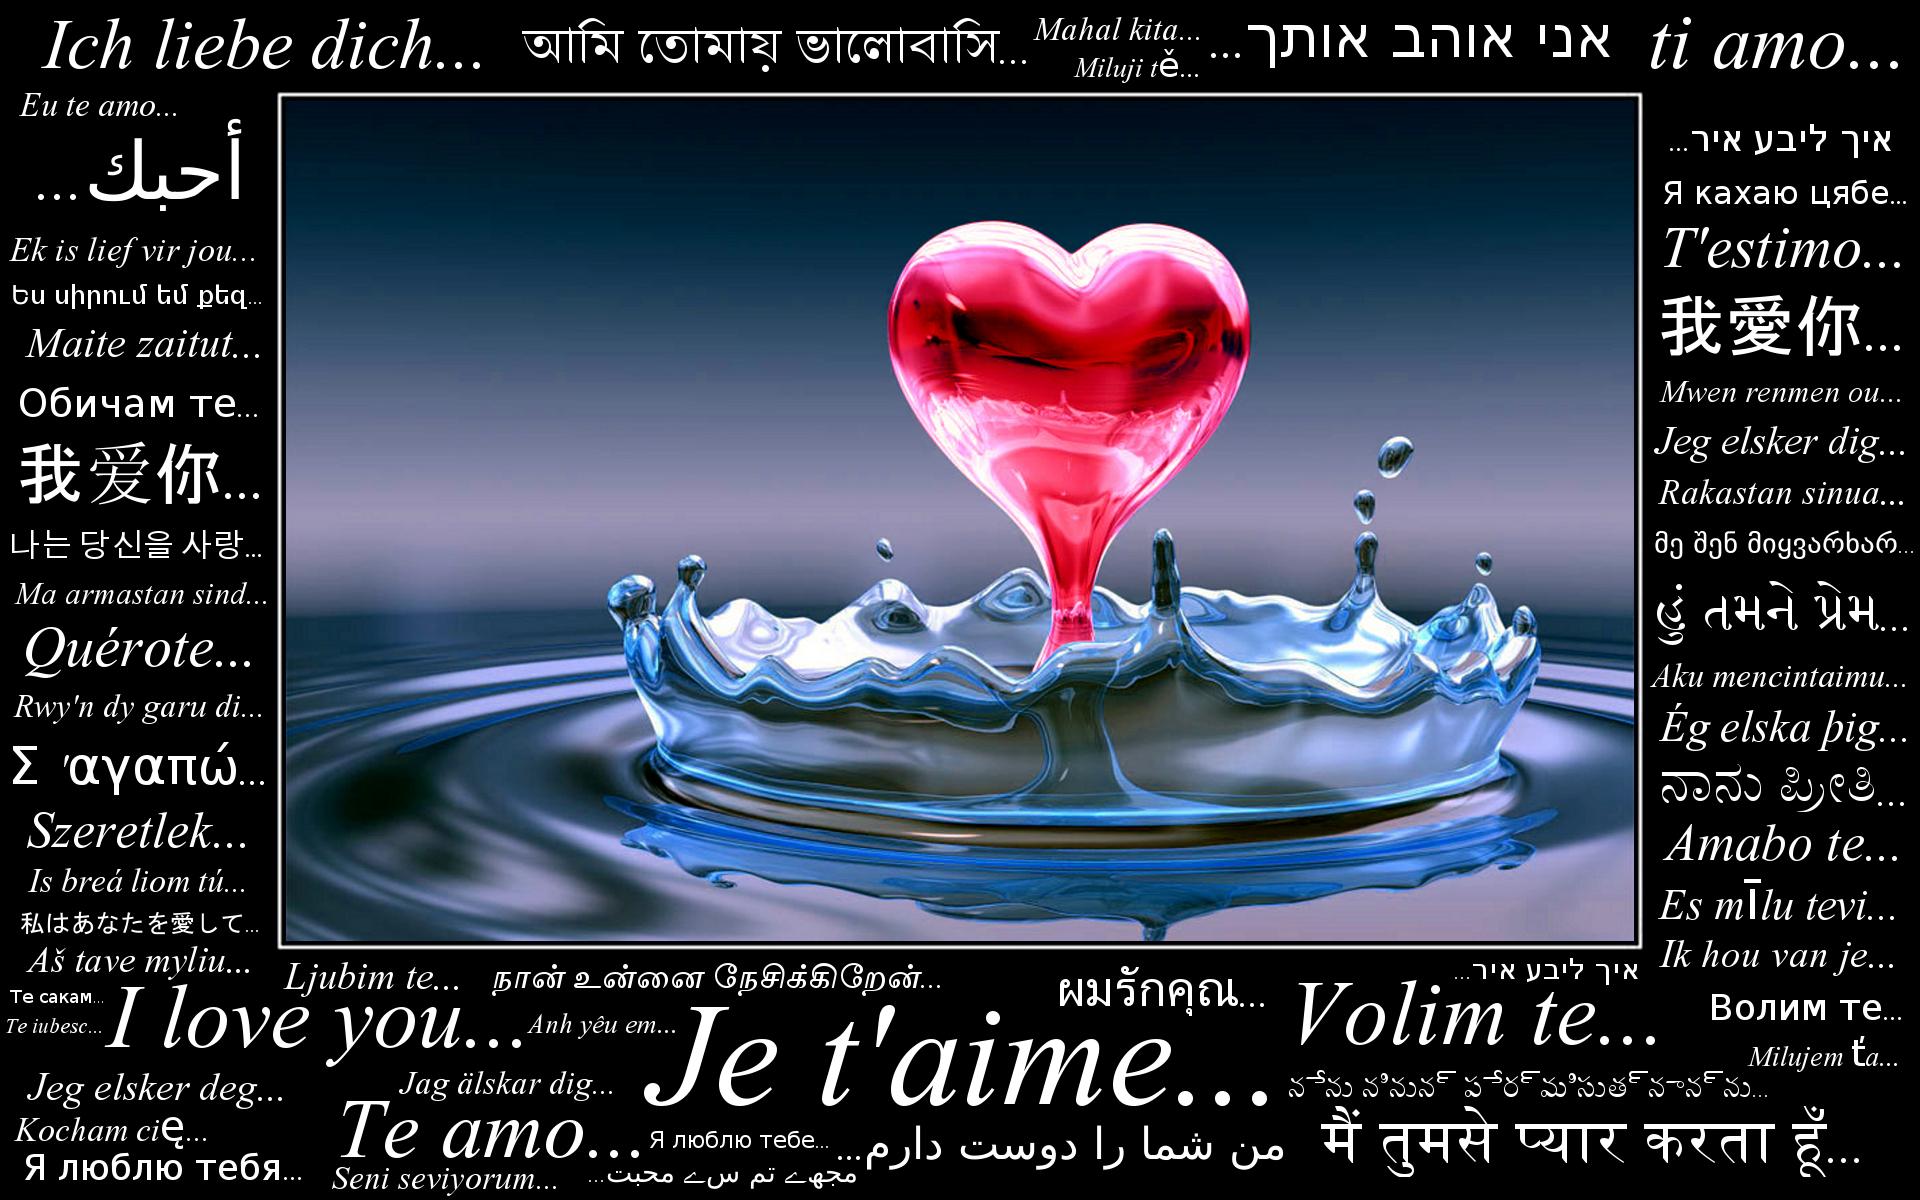 I Love You Wallpaper For Wife : Love You Wife Wallpaper - WallpaperSafari